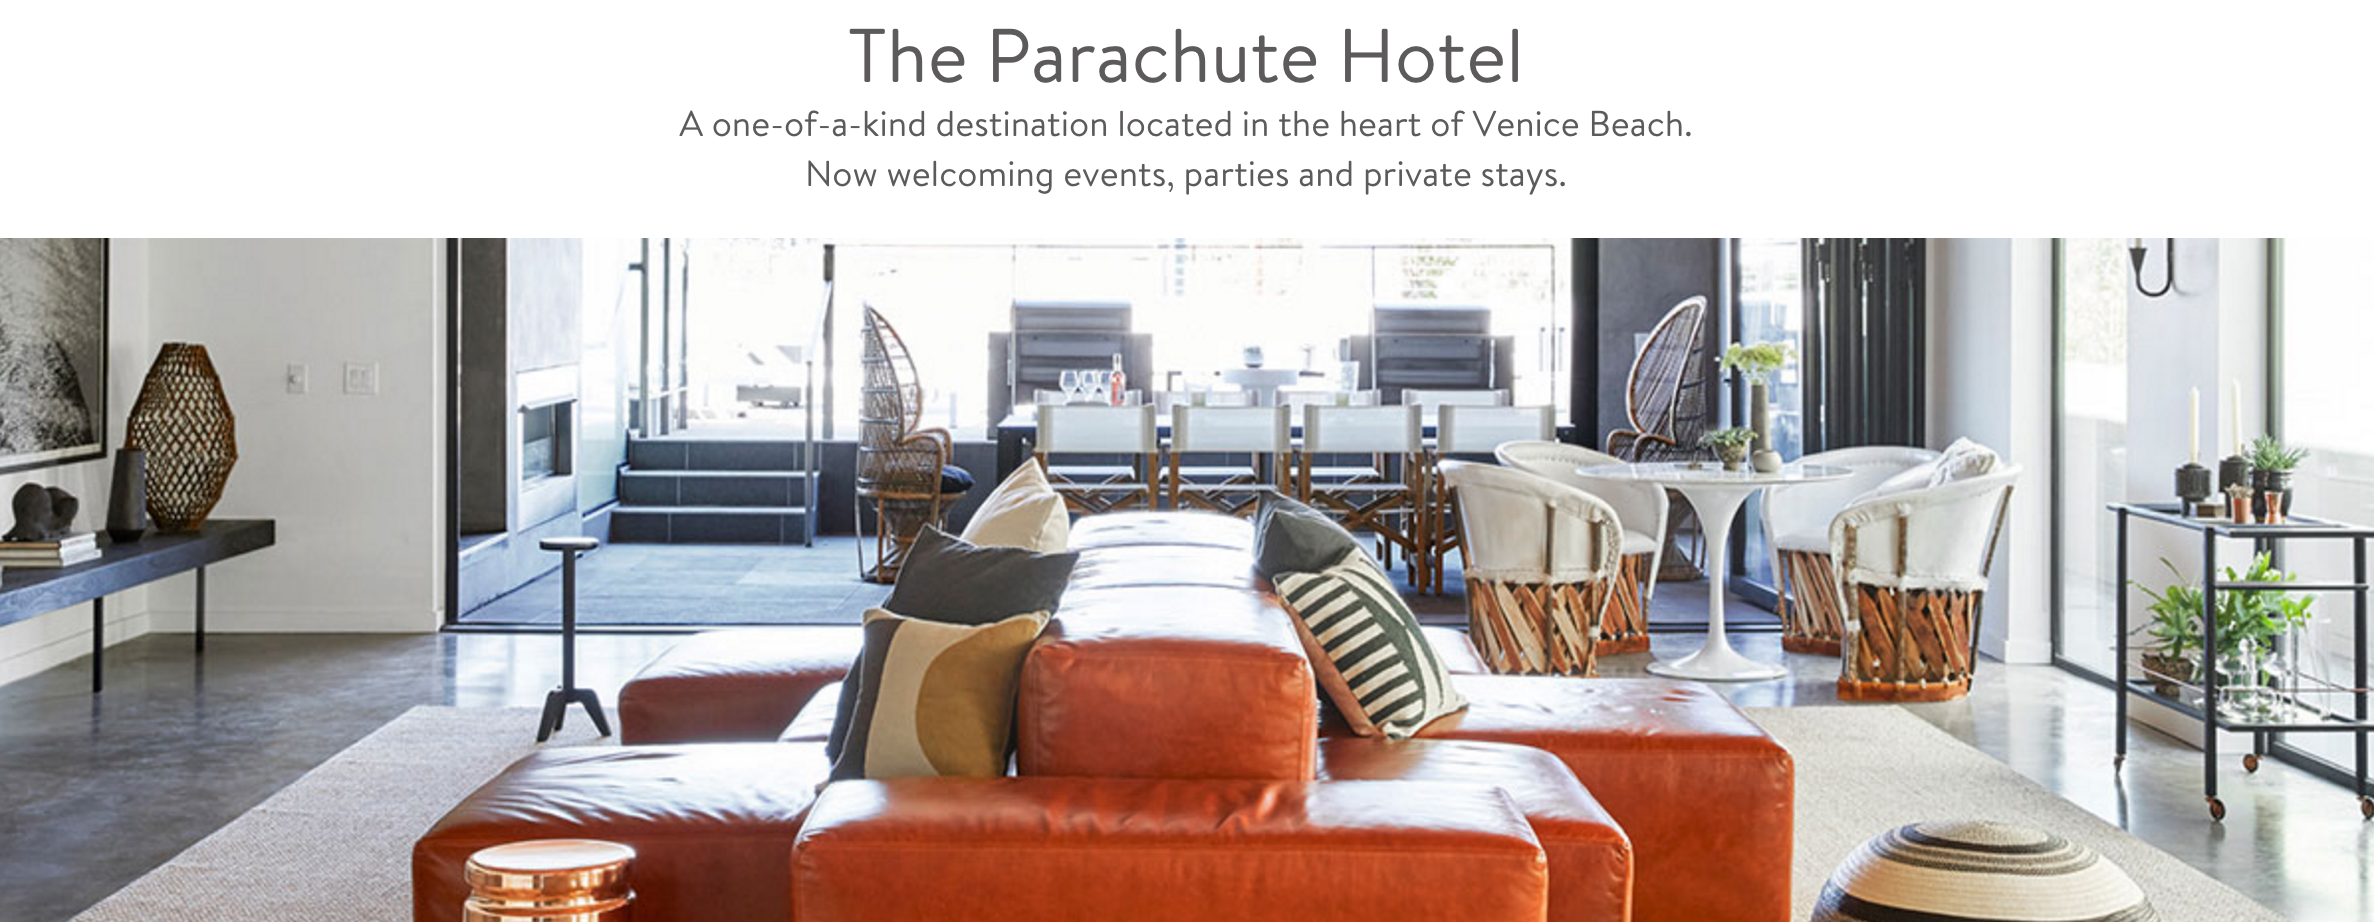 The Parachute Hotel